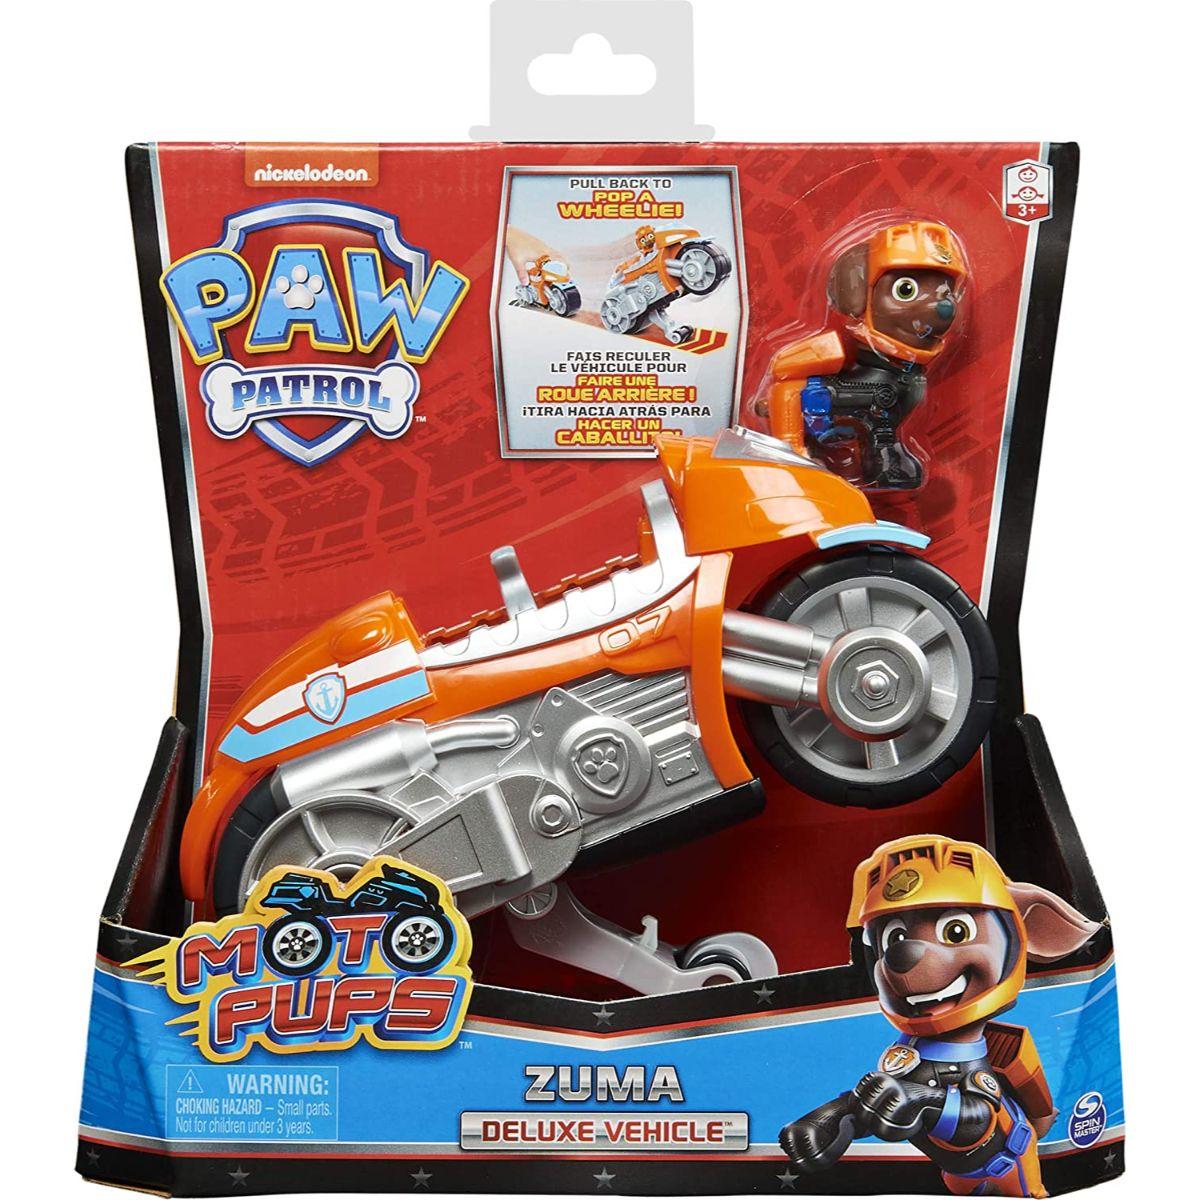 Motocicleta si figurina Paw Patrol Moto Pups, Zuma, 20130046